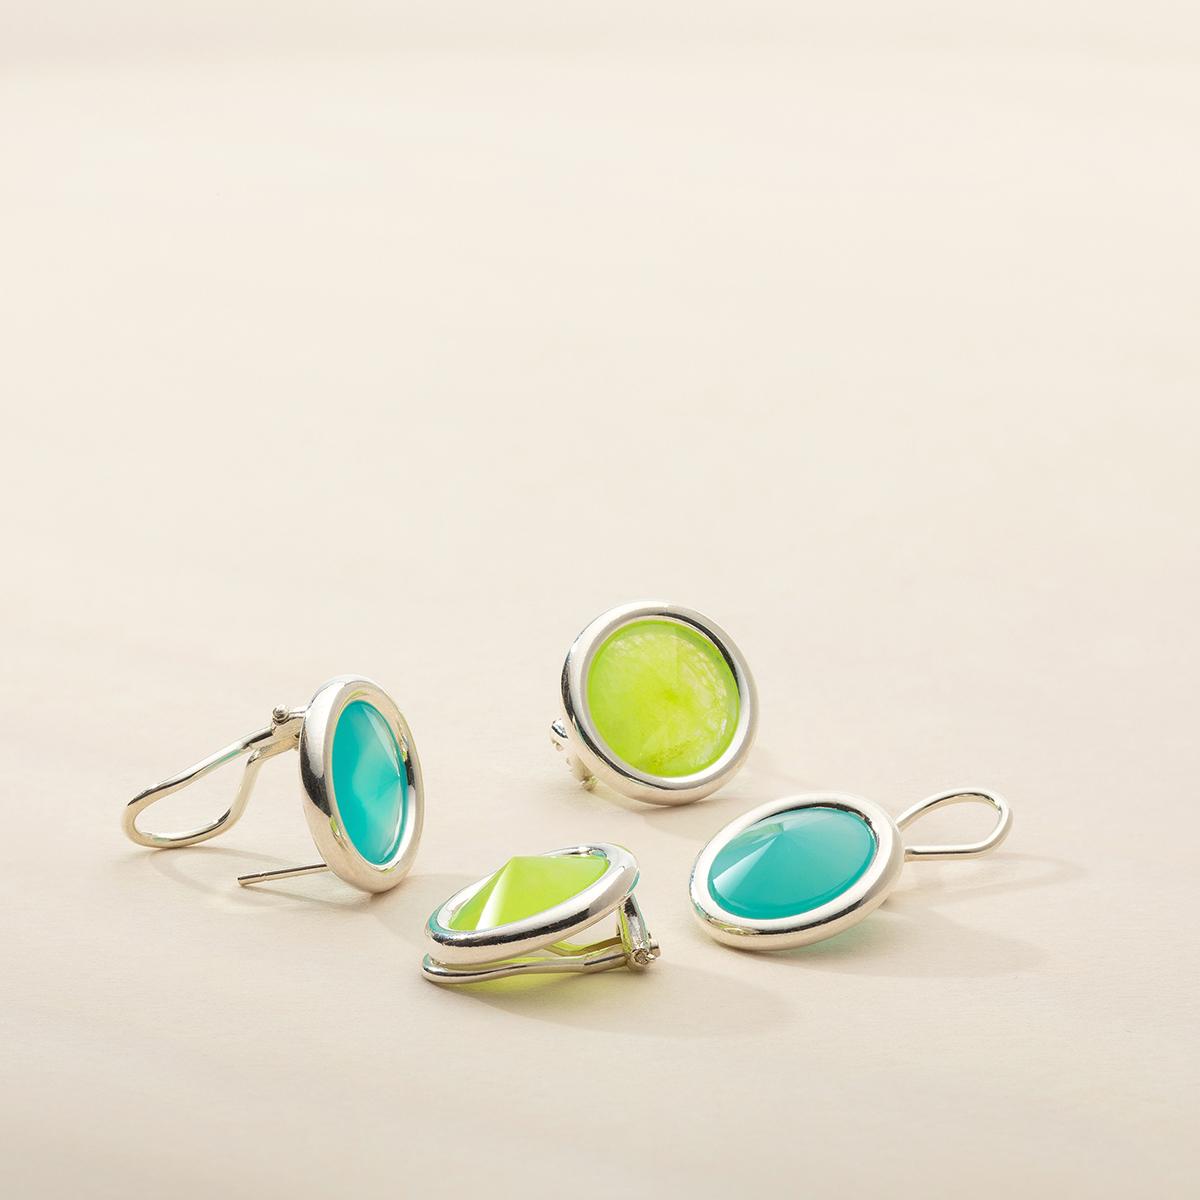 biżuteria srebrna z kamieniami